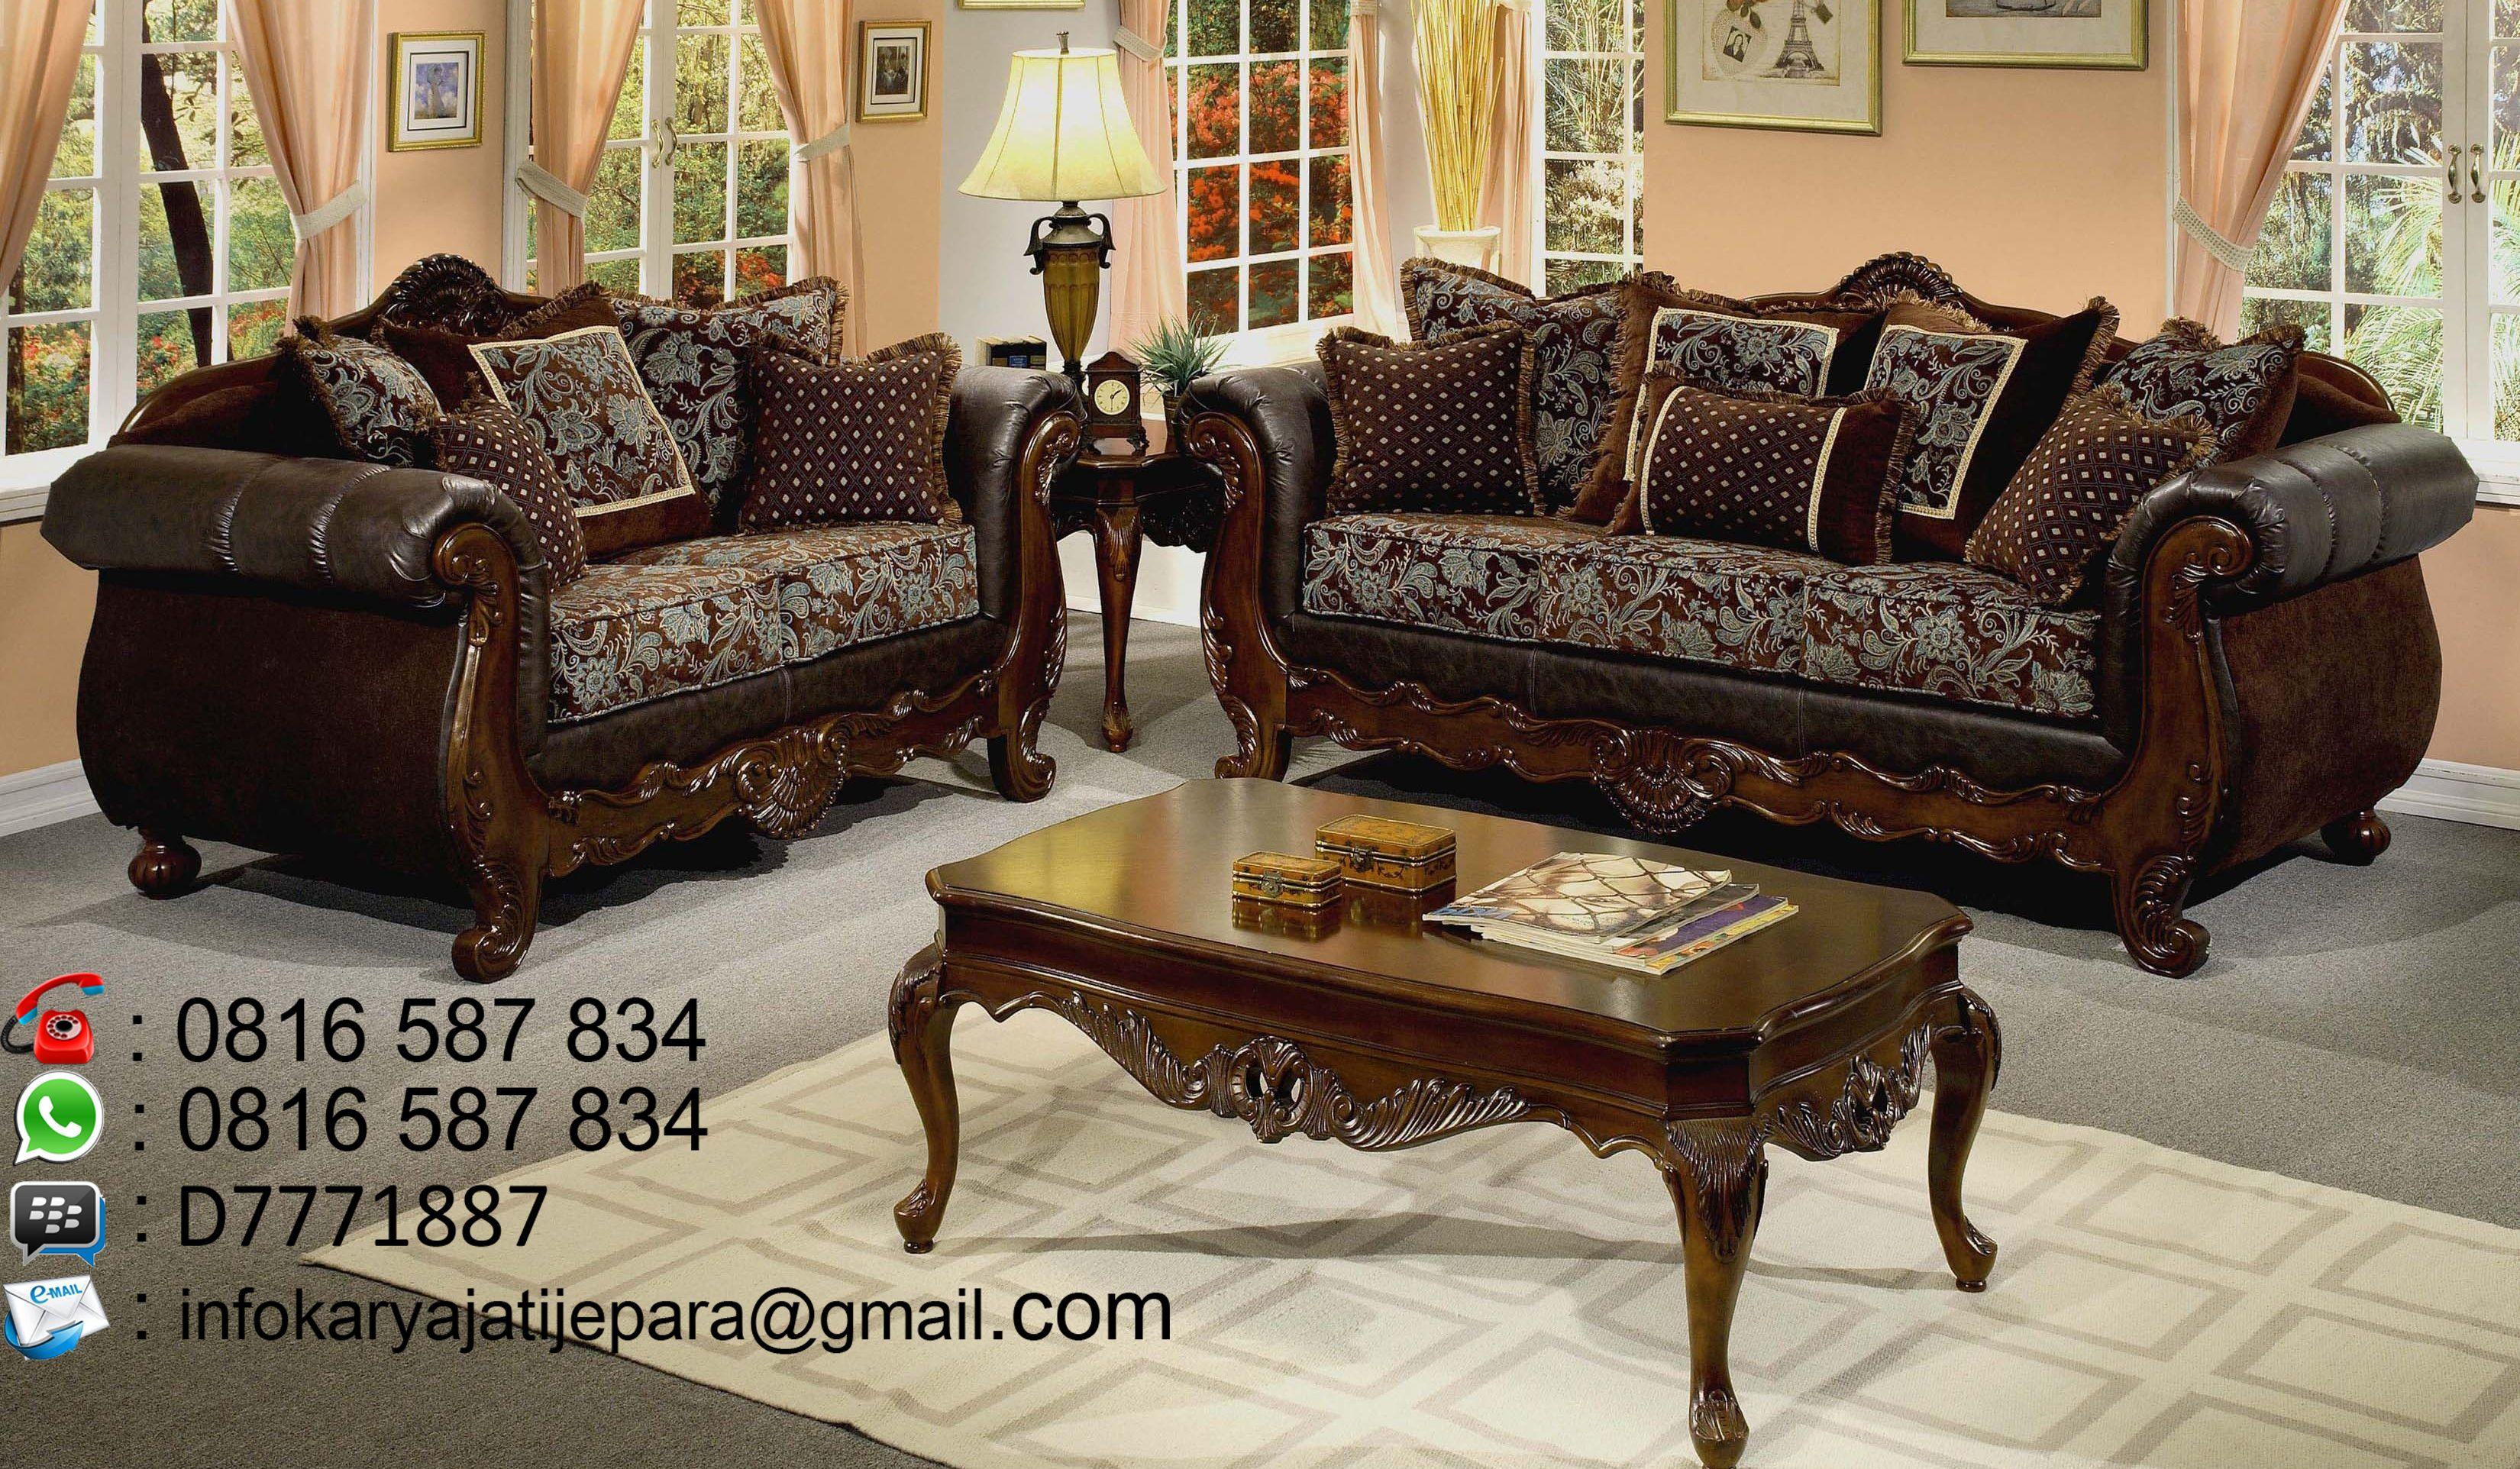 Kursi Tamu Sofa Kayu Jati Ukir Mewah Ini Dibuat Oleh Pengrajin Kami Yang Sangat Handal Dib Ruang Keluarga Mewah Furnitur Ruang Keluarga Dekorasi Ruang Keluarga #serta #living #room #set